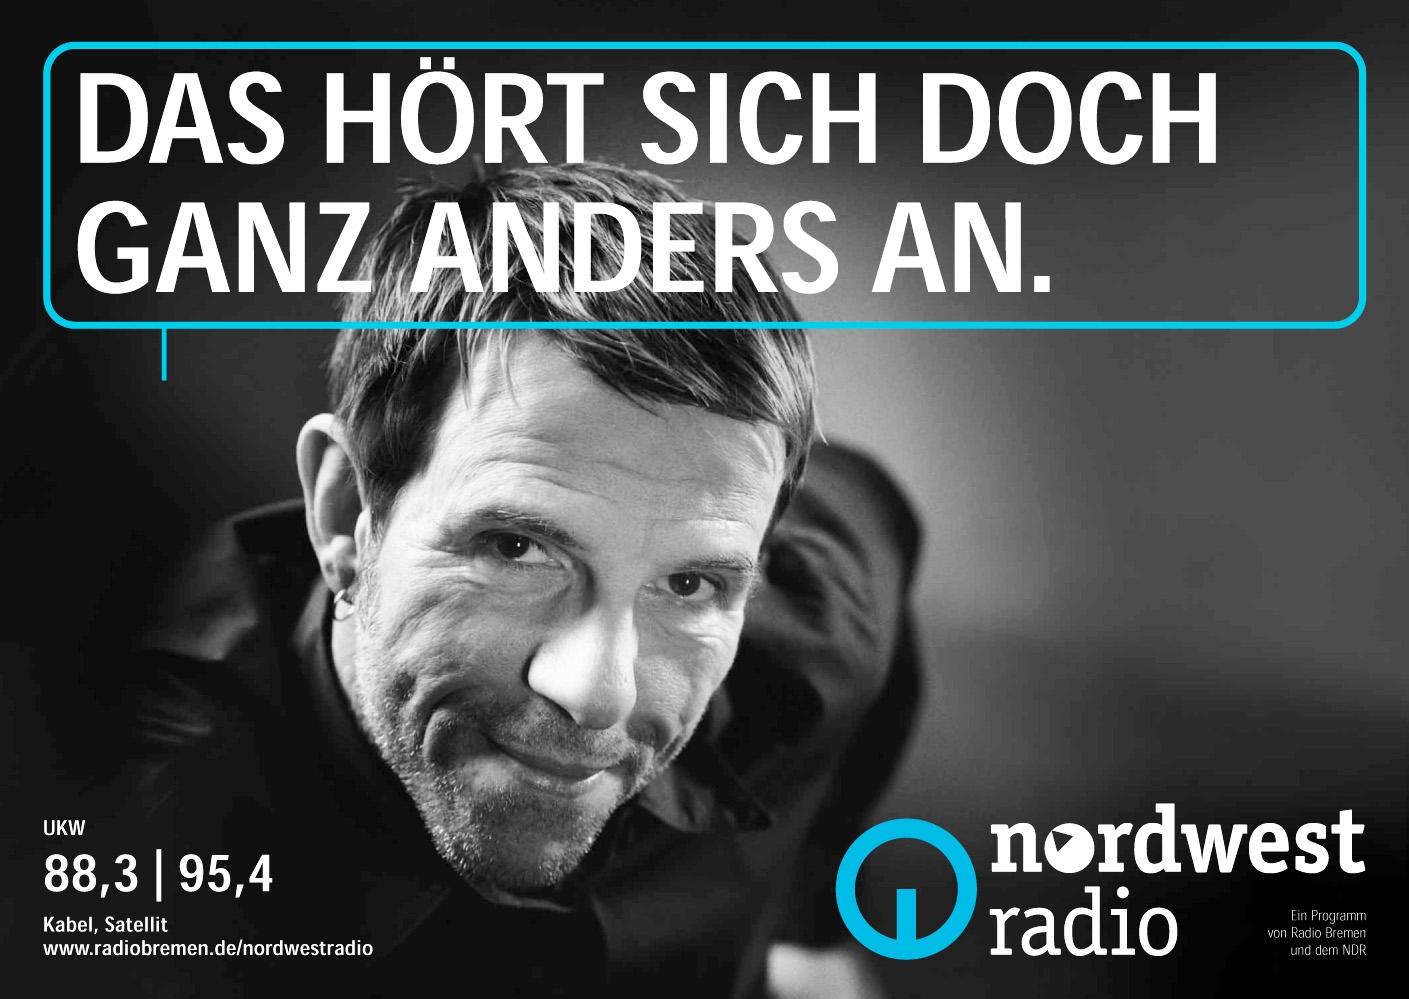 nordwestradio kampagne